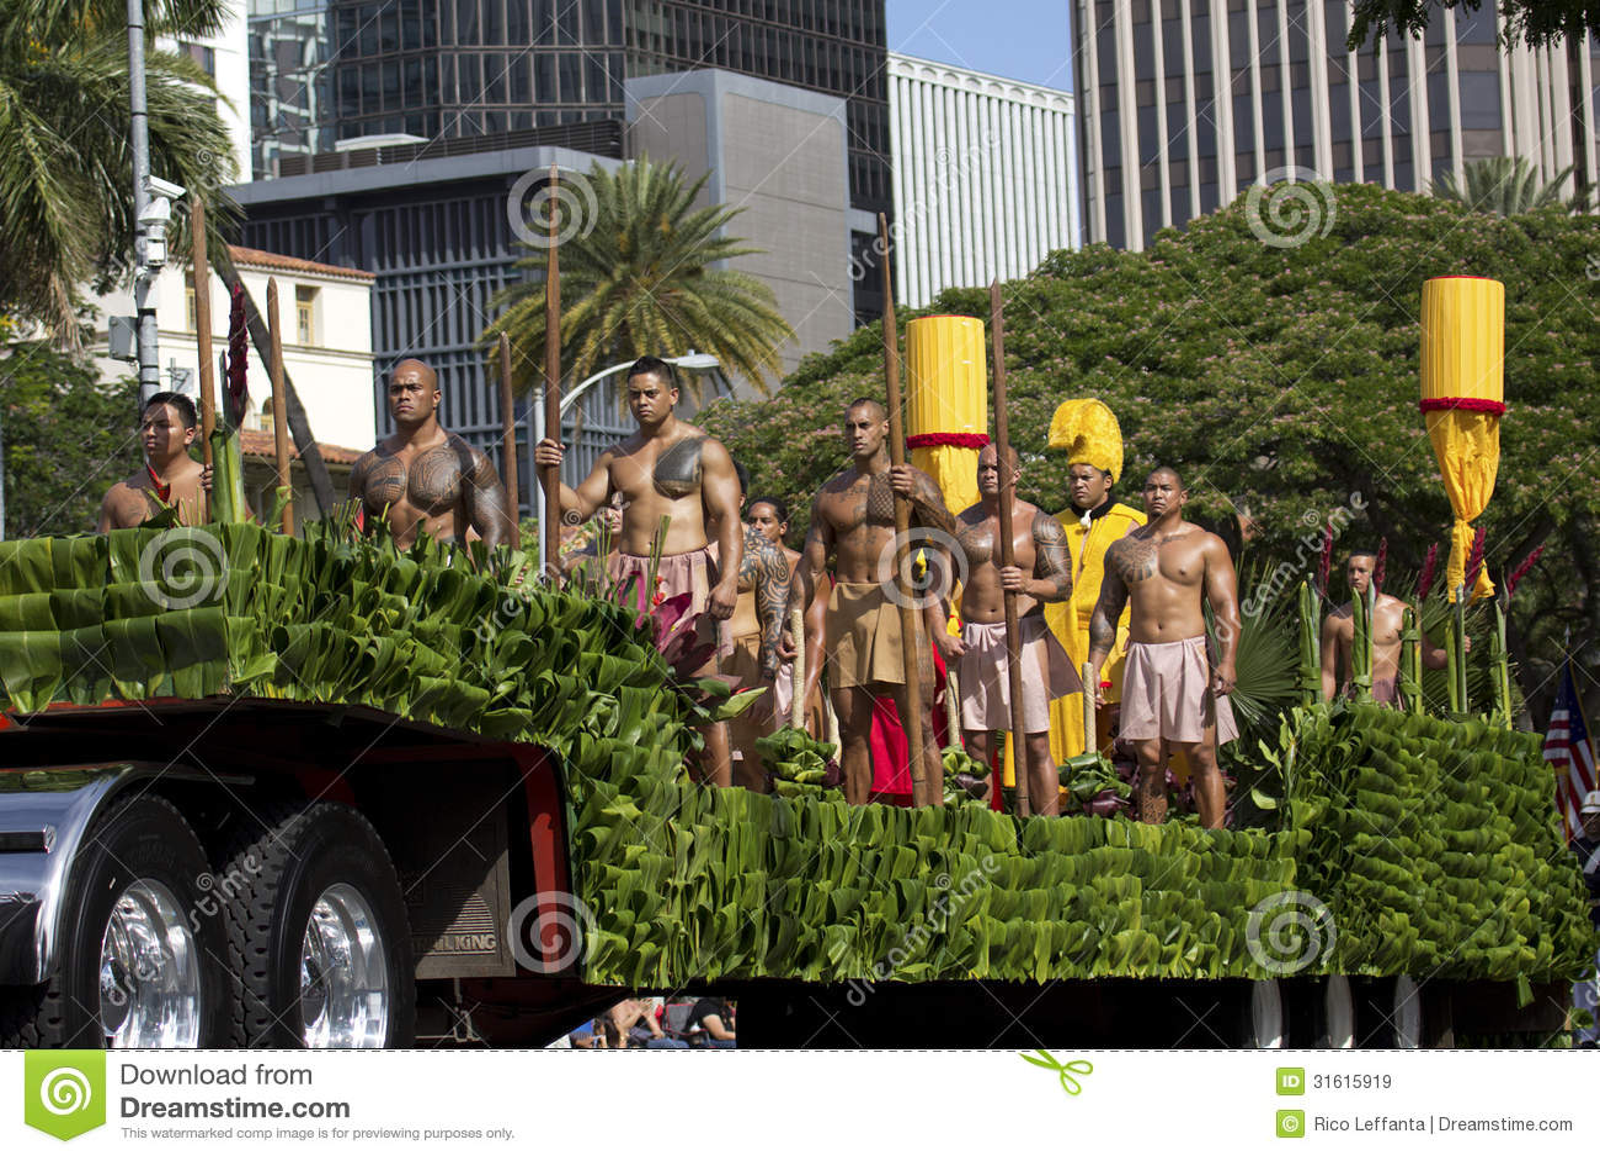 Hawaiian Warriors Editorial Stock Image Image Of Leffanta